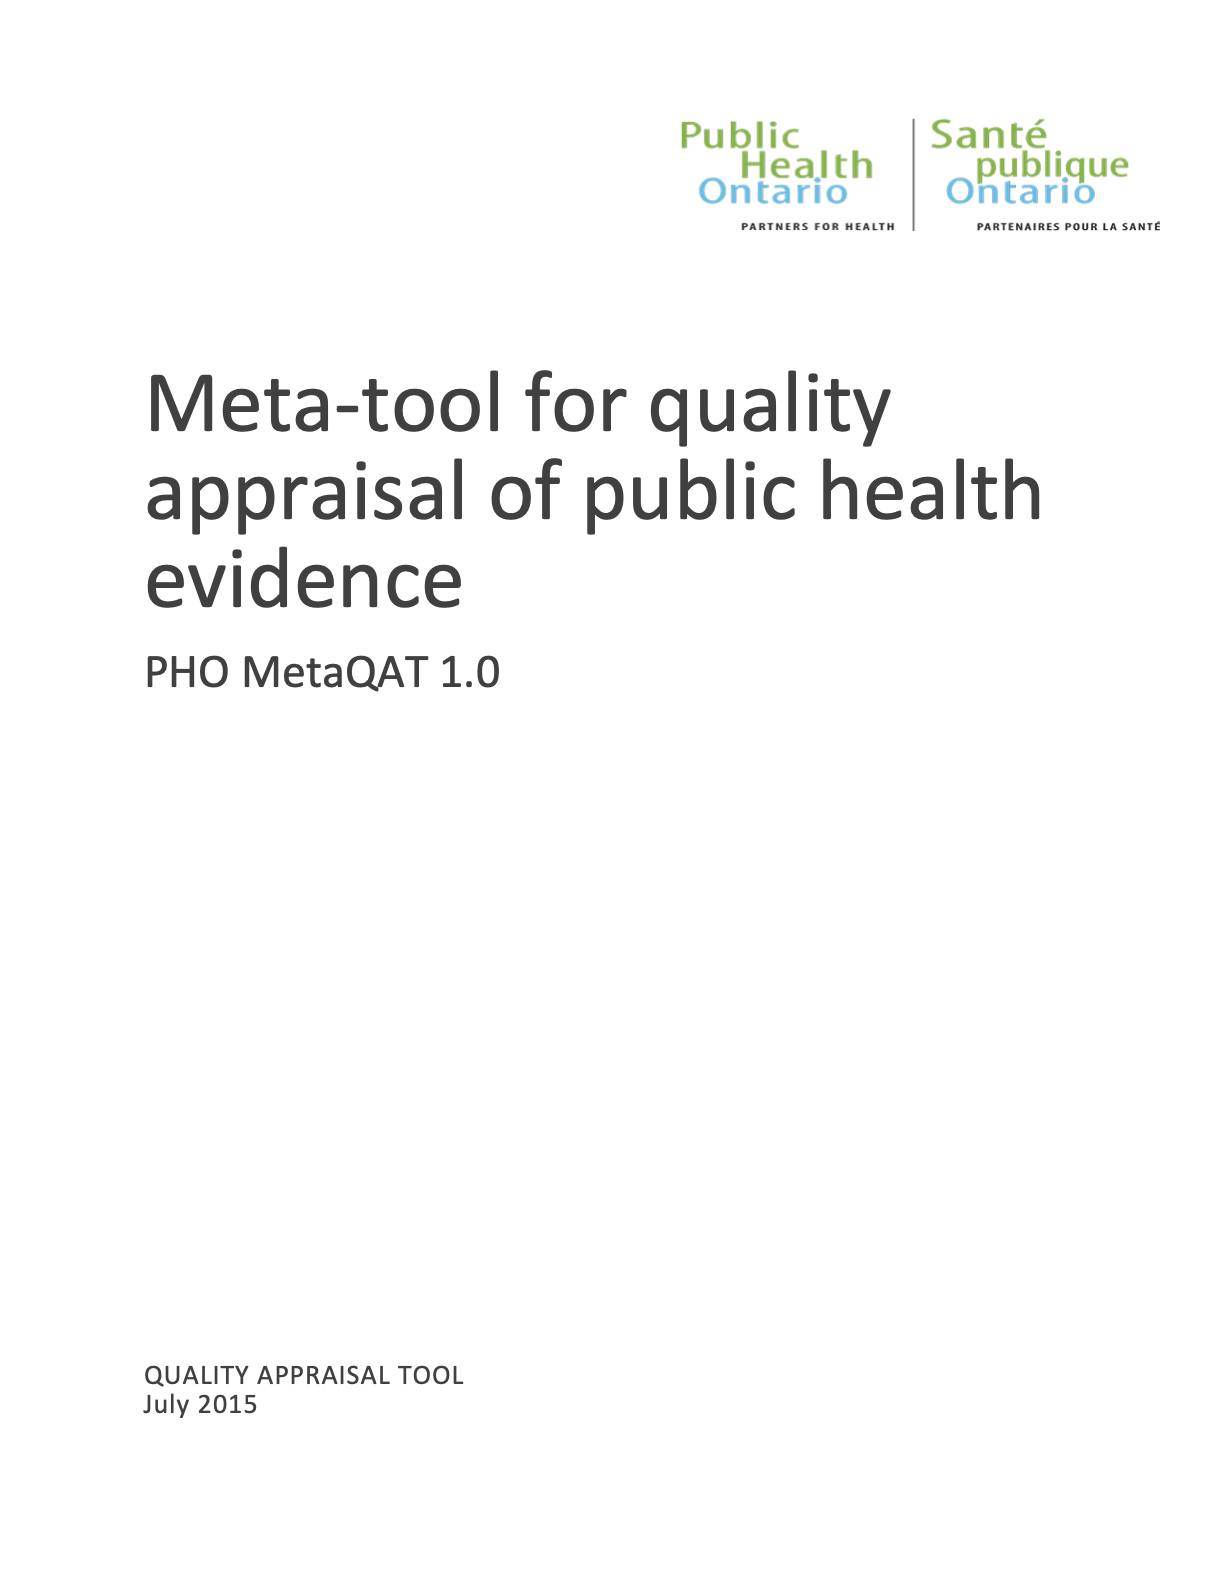 Meta-Tool for Quality Appraisal of Public Health Evidence: Public Health Ontario (PHO) MetaQAT 1.0